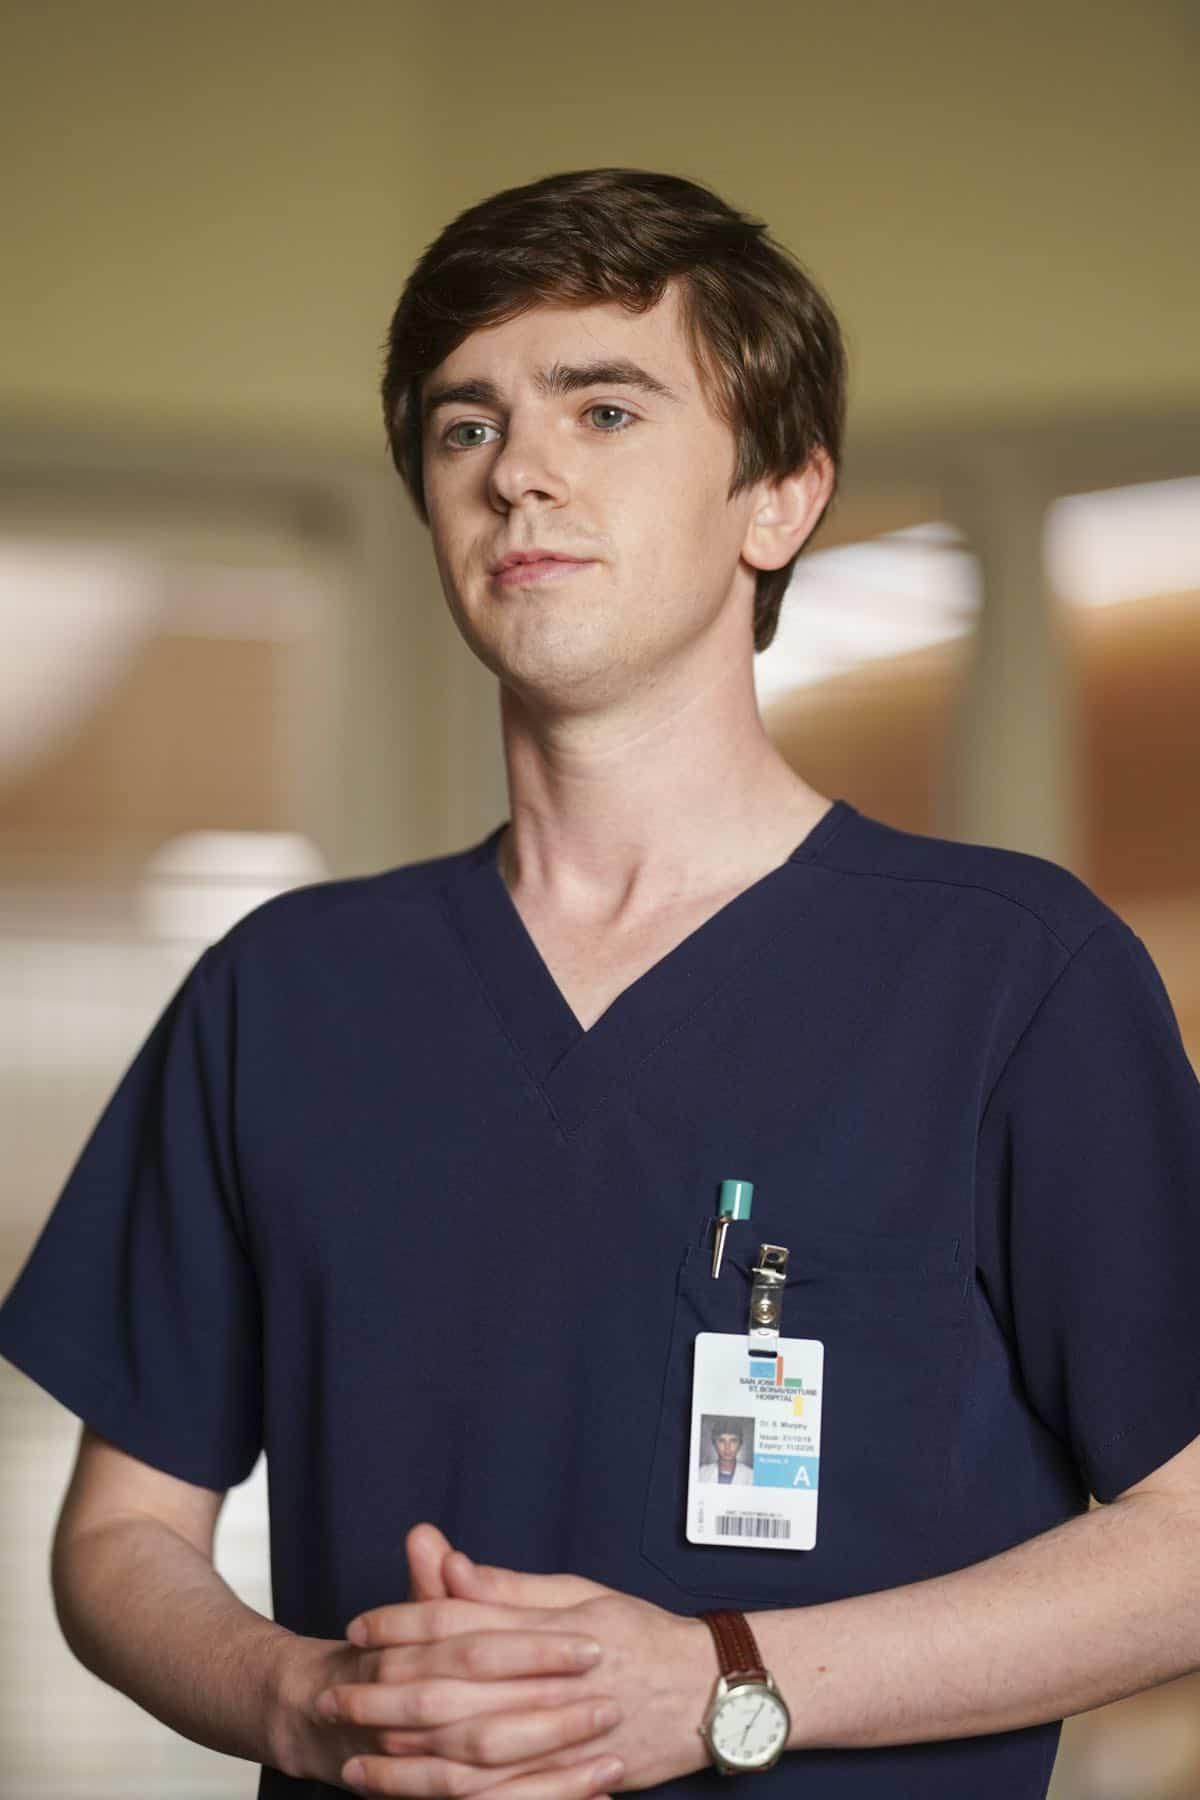 THE GOOD DOCTOR Season 3 Episode 1 Disaster 03